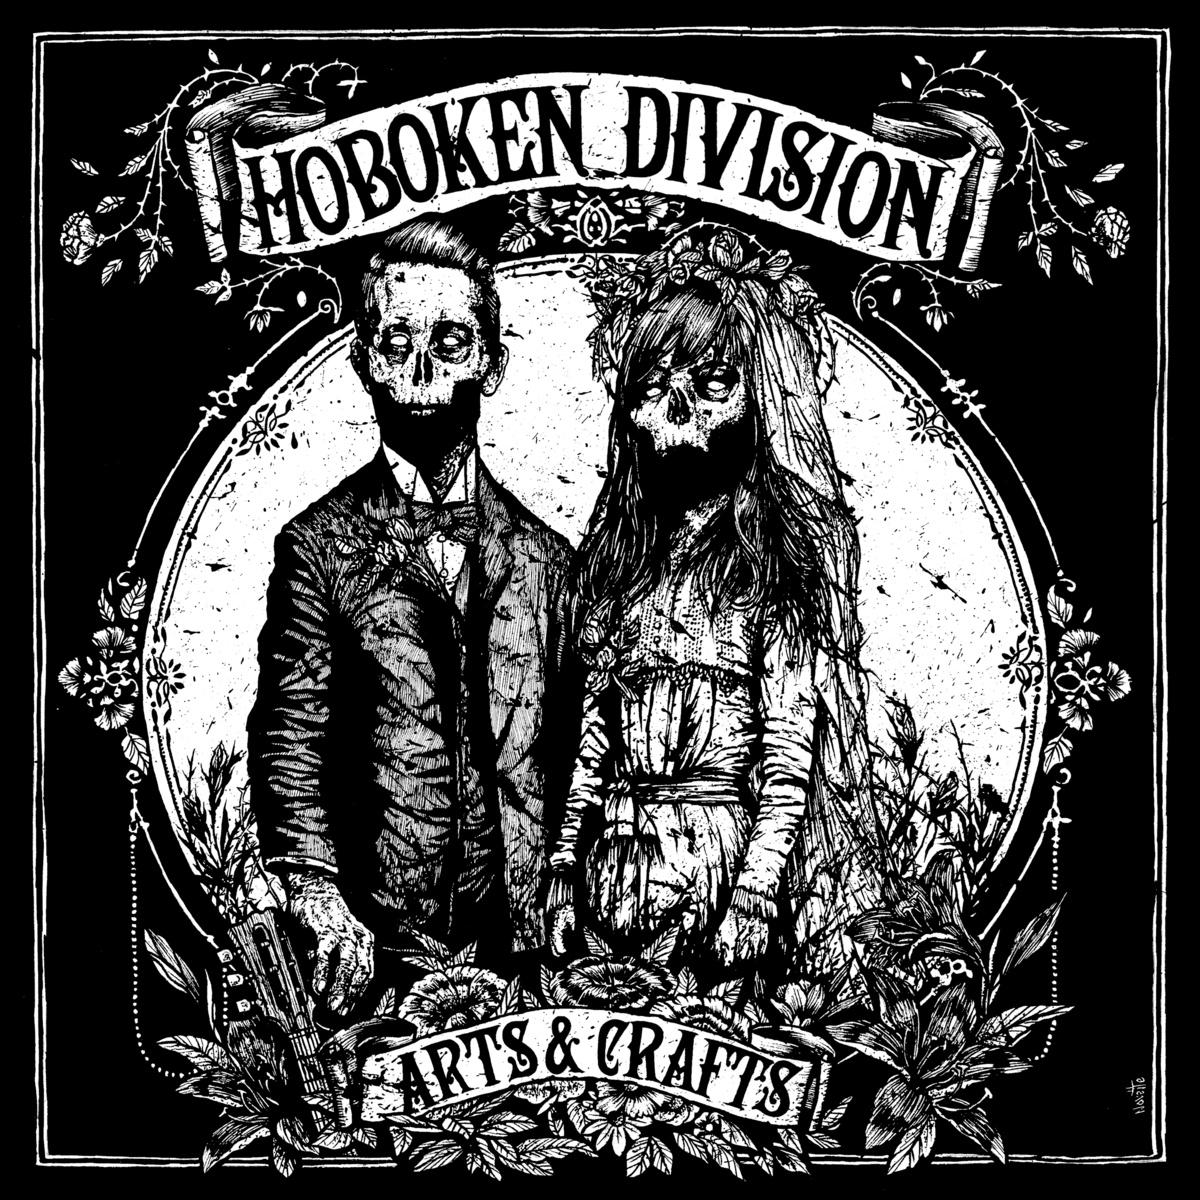 HOBOKEN DIVISION Arts & Crafts LP